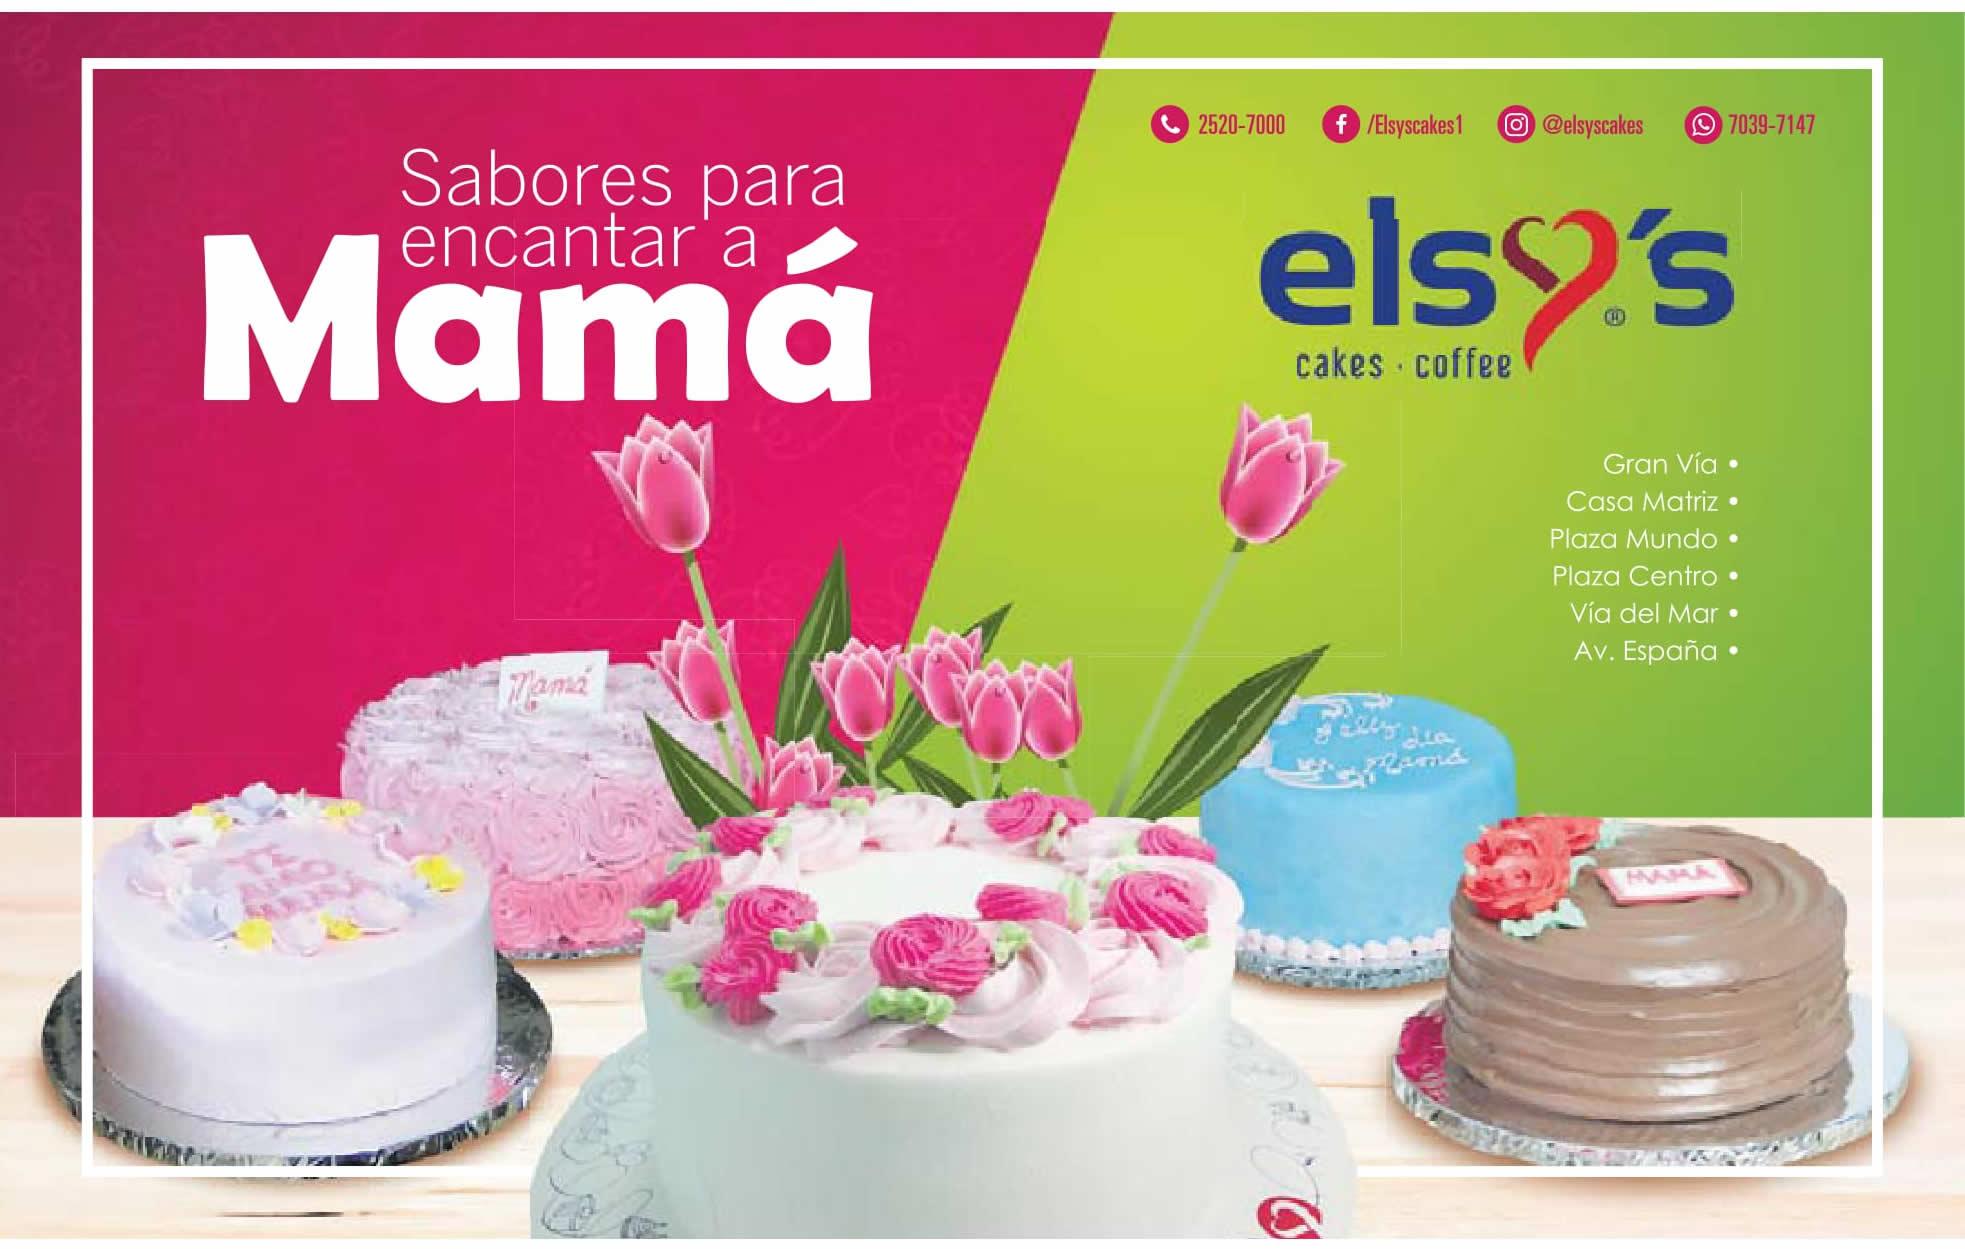 Elsys-cakes